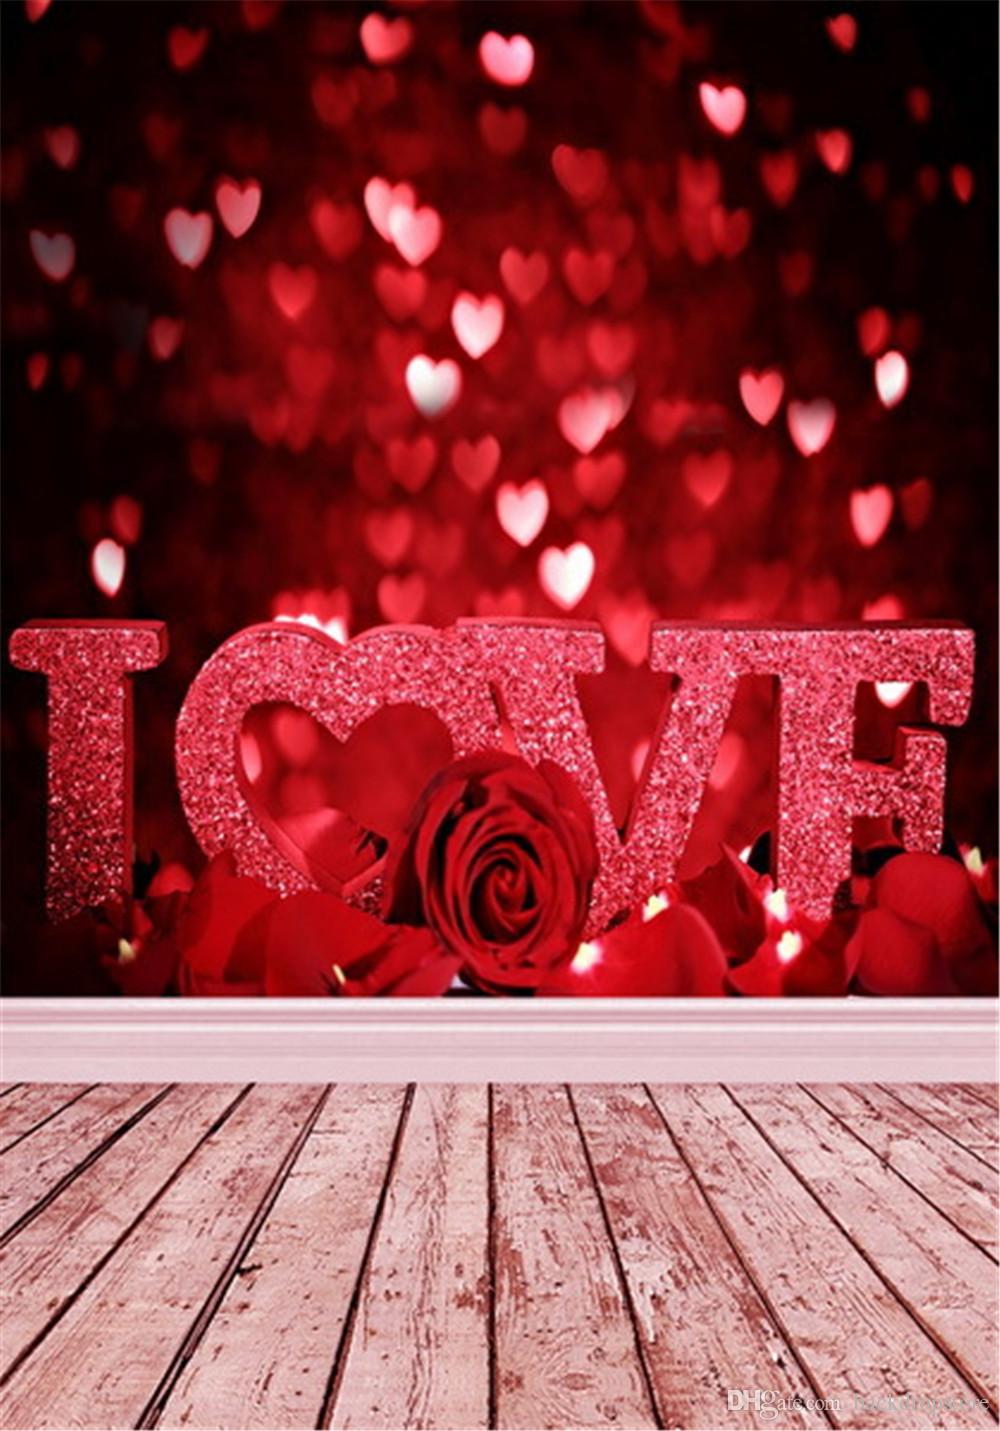 2018 Sparkle Love Hearts Red Bokeh Backdrops Romantic